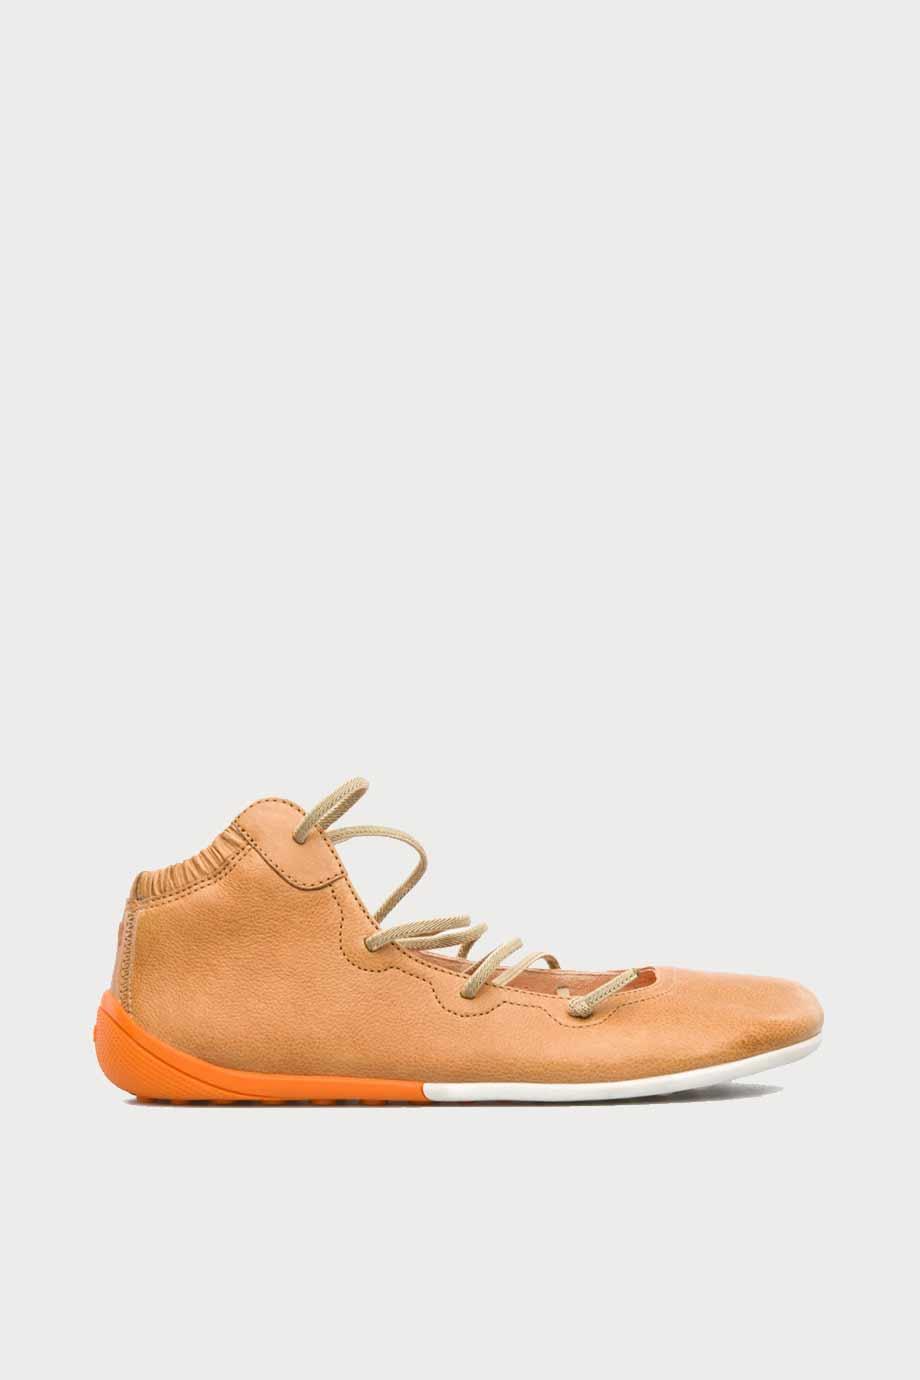 spiridoula metheniti shoes xalkida p Camper 46256 024 Peu Circuit leather 2